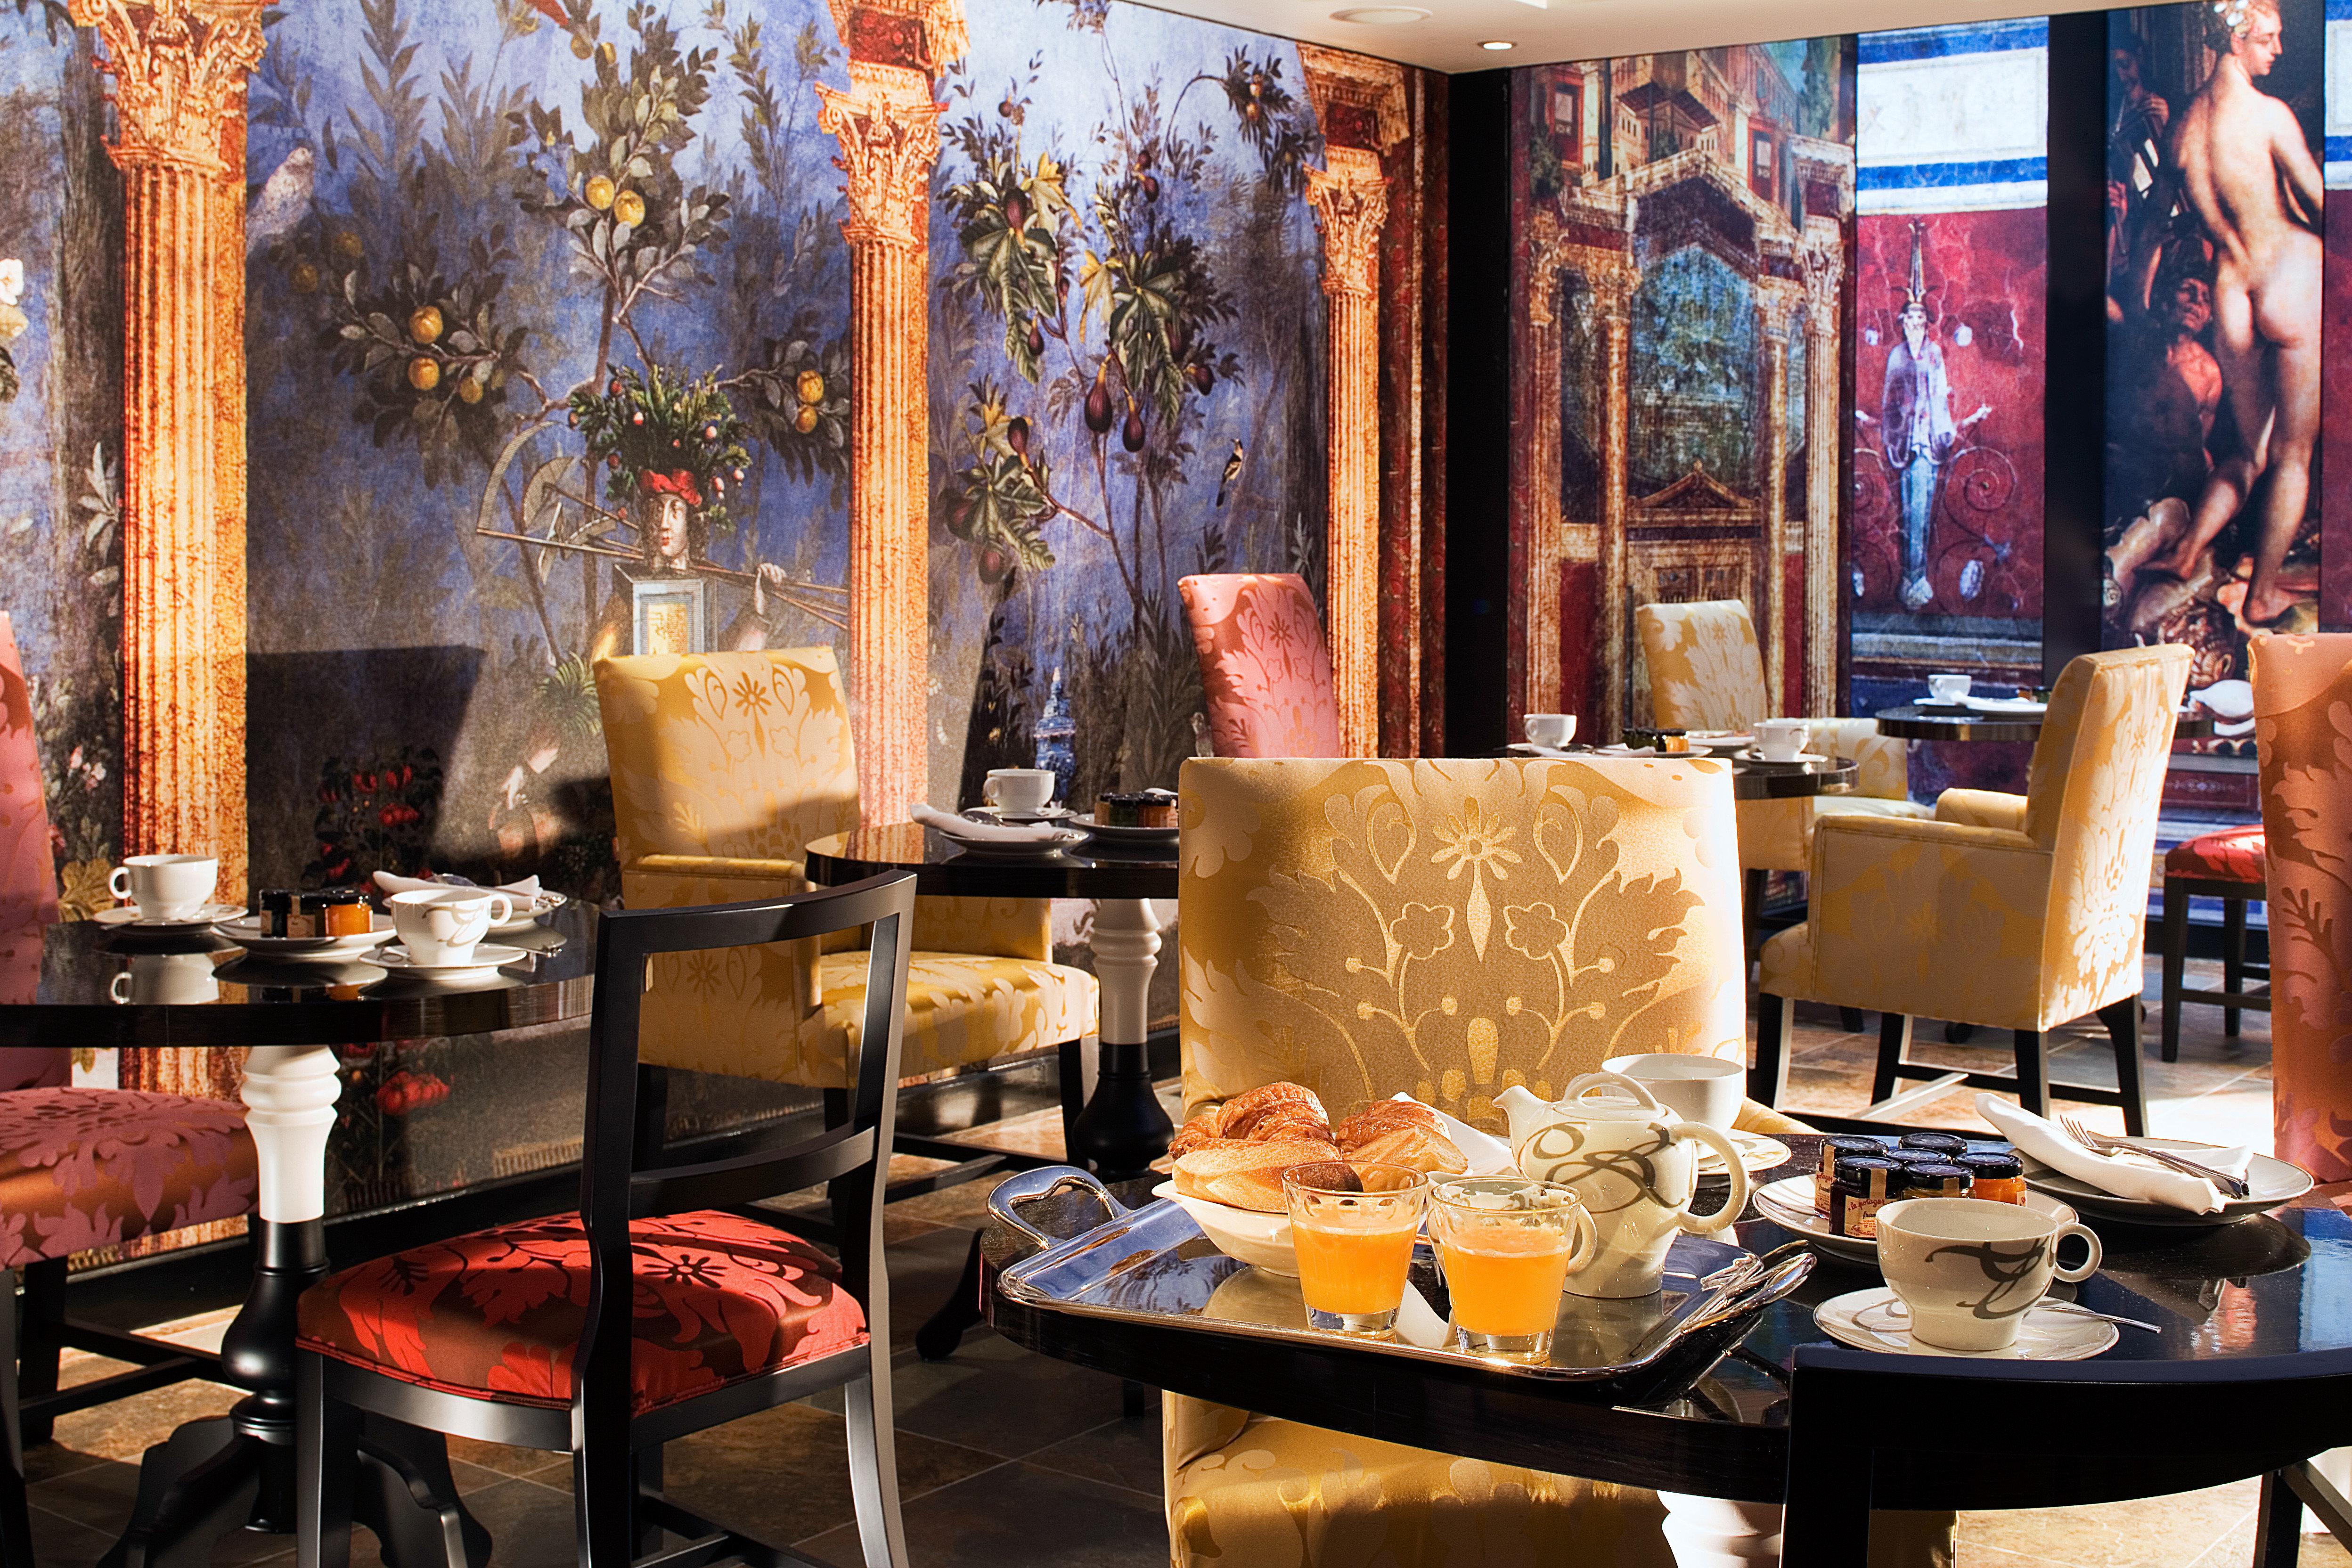 Dining Drink Eat Elegant Historic restaurant art Boutique living room cluttered dining table